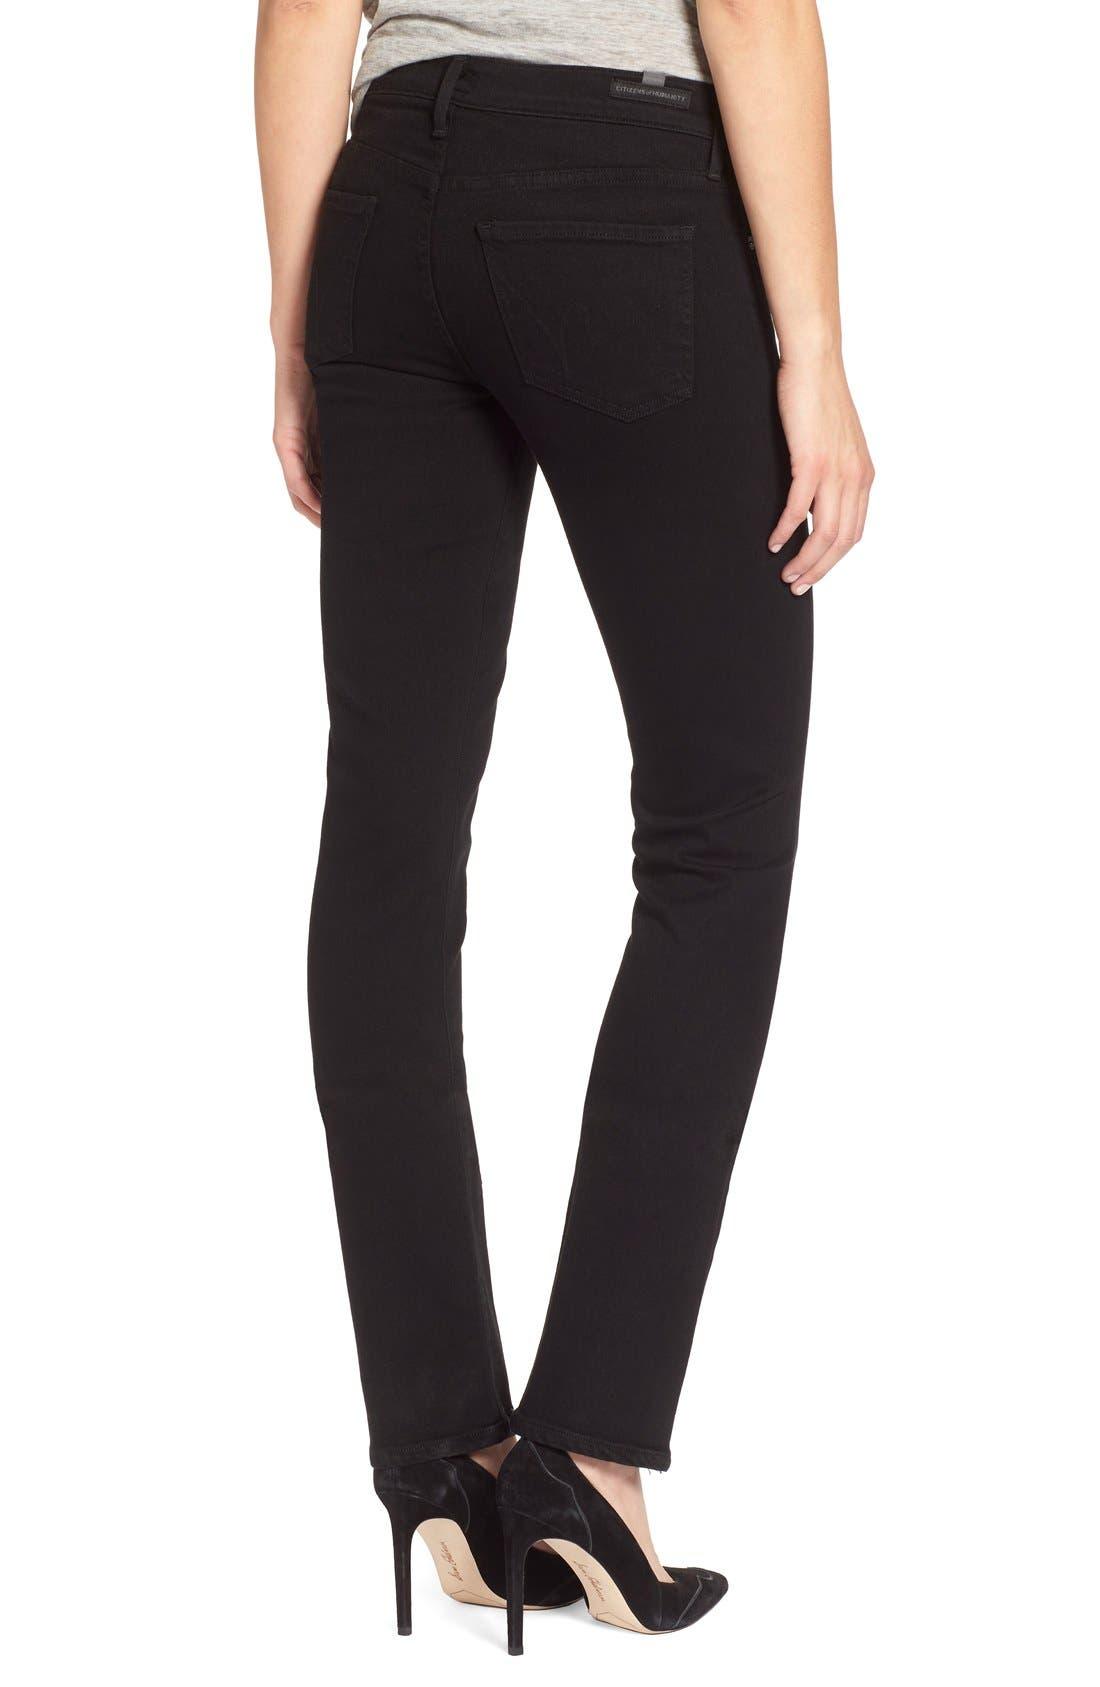 'Ava' Straight Leg Jeans,                             Alternate thumbnail 5, color,                             003